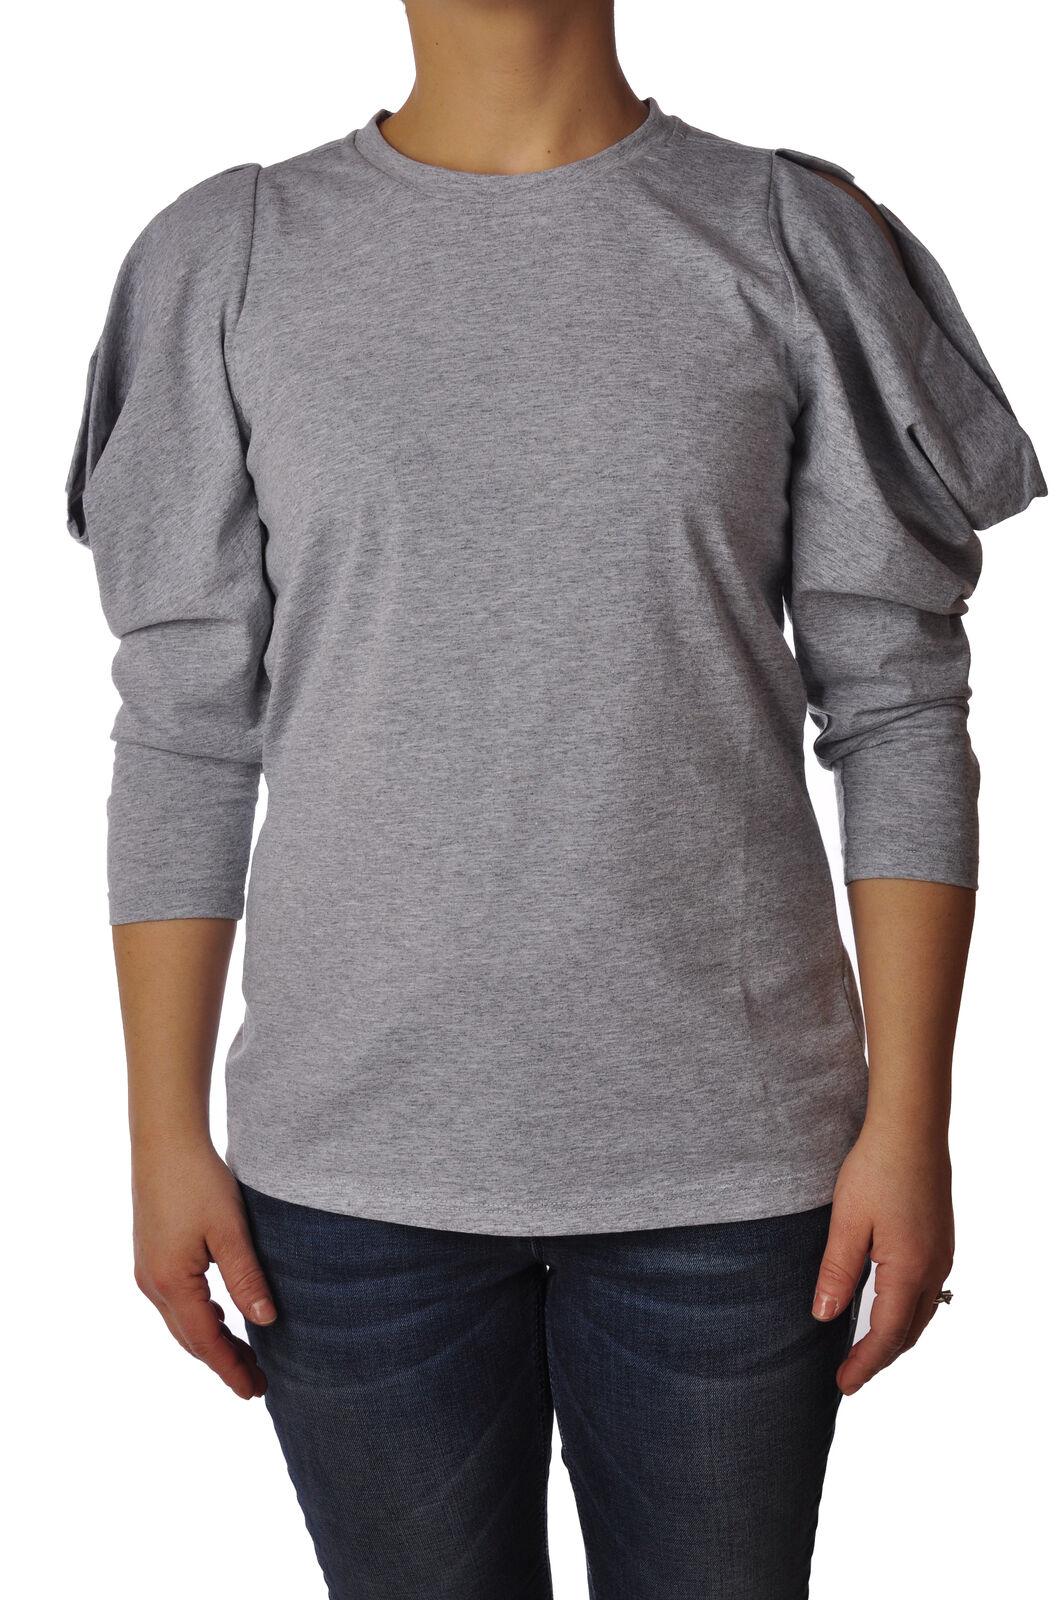 Rosao - Topwear-T-shirts - Woman - grau - 3355906E183811